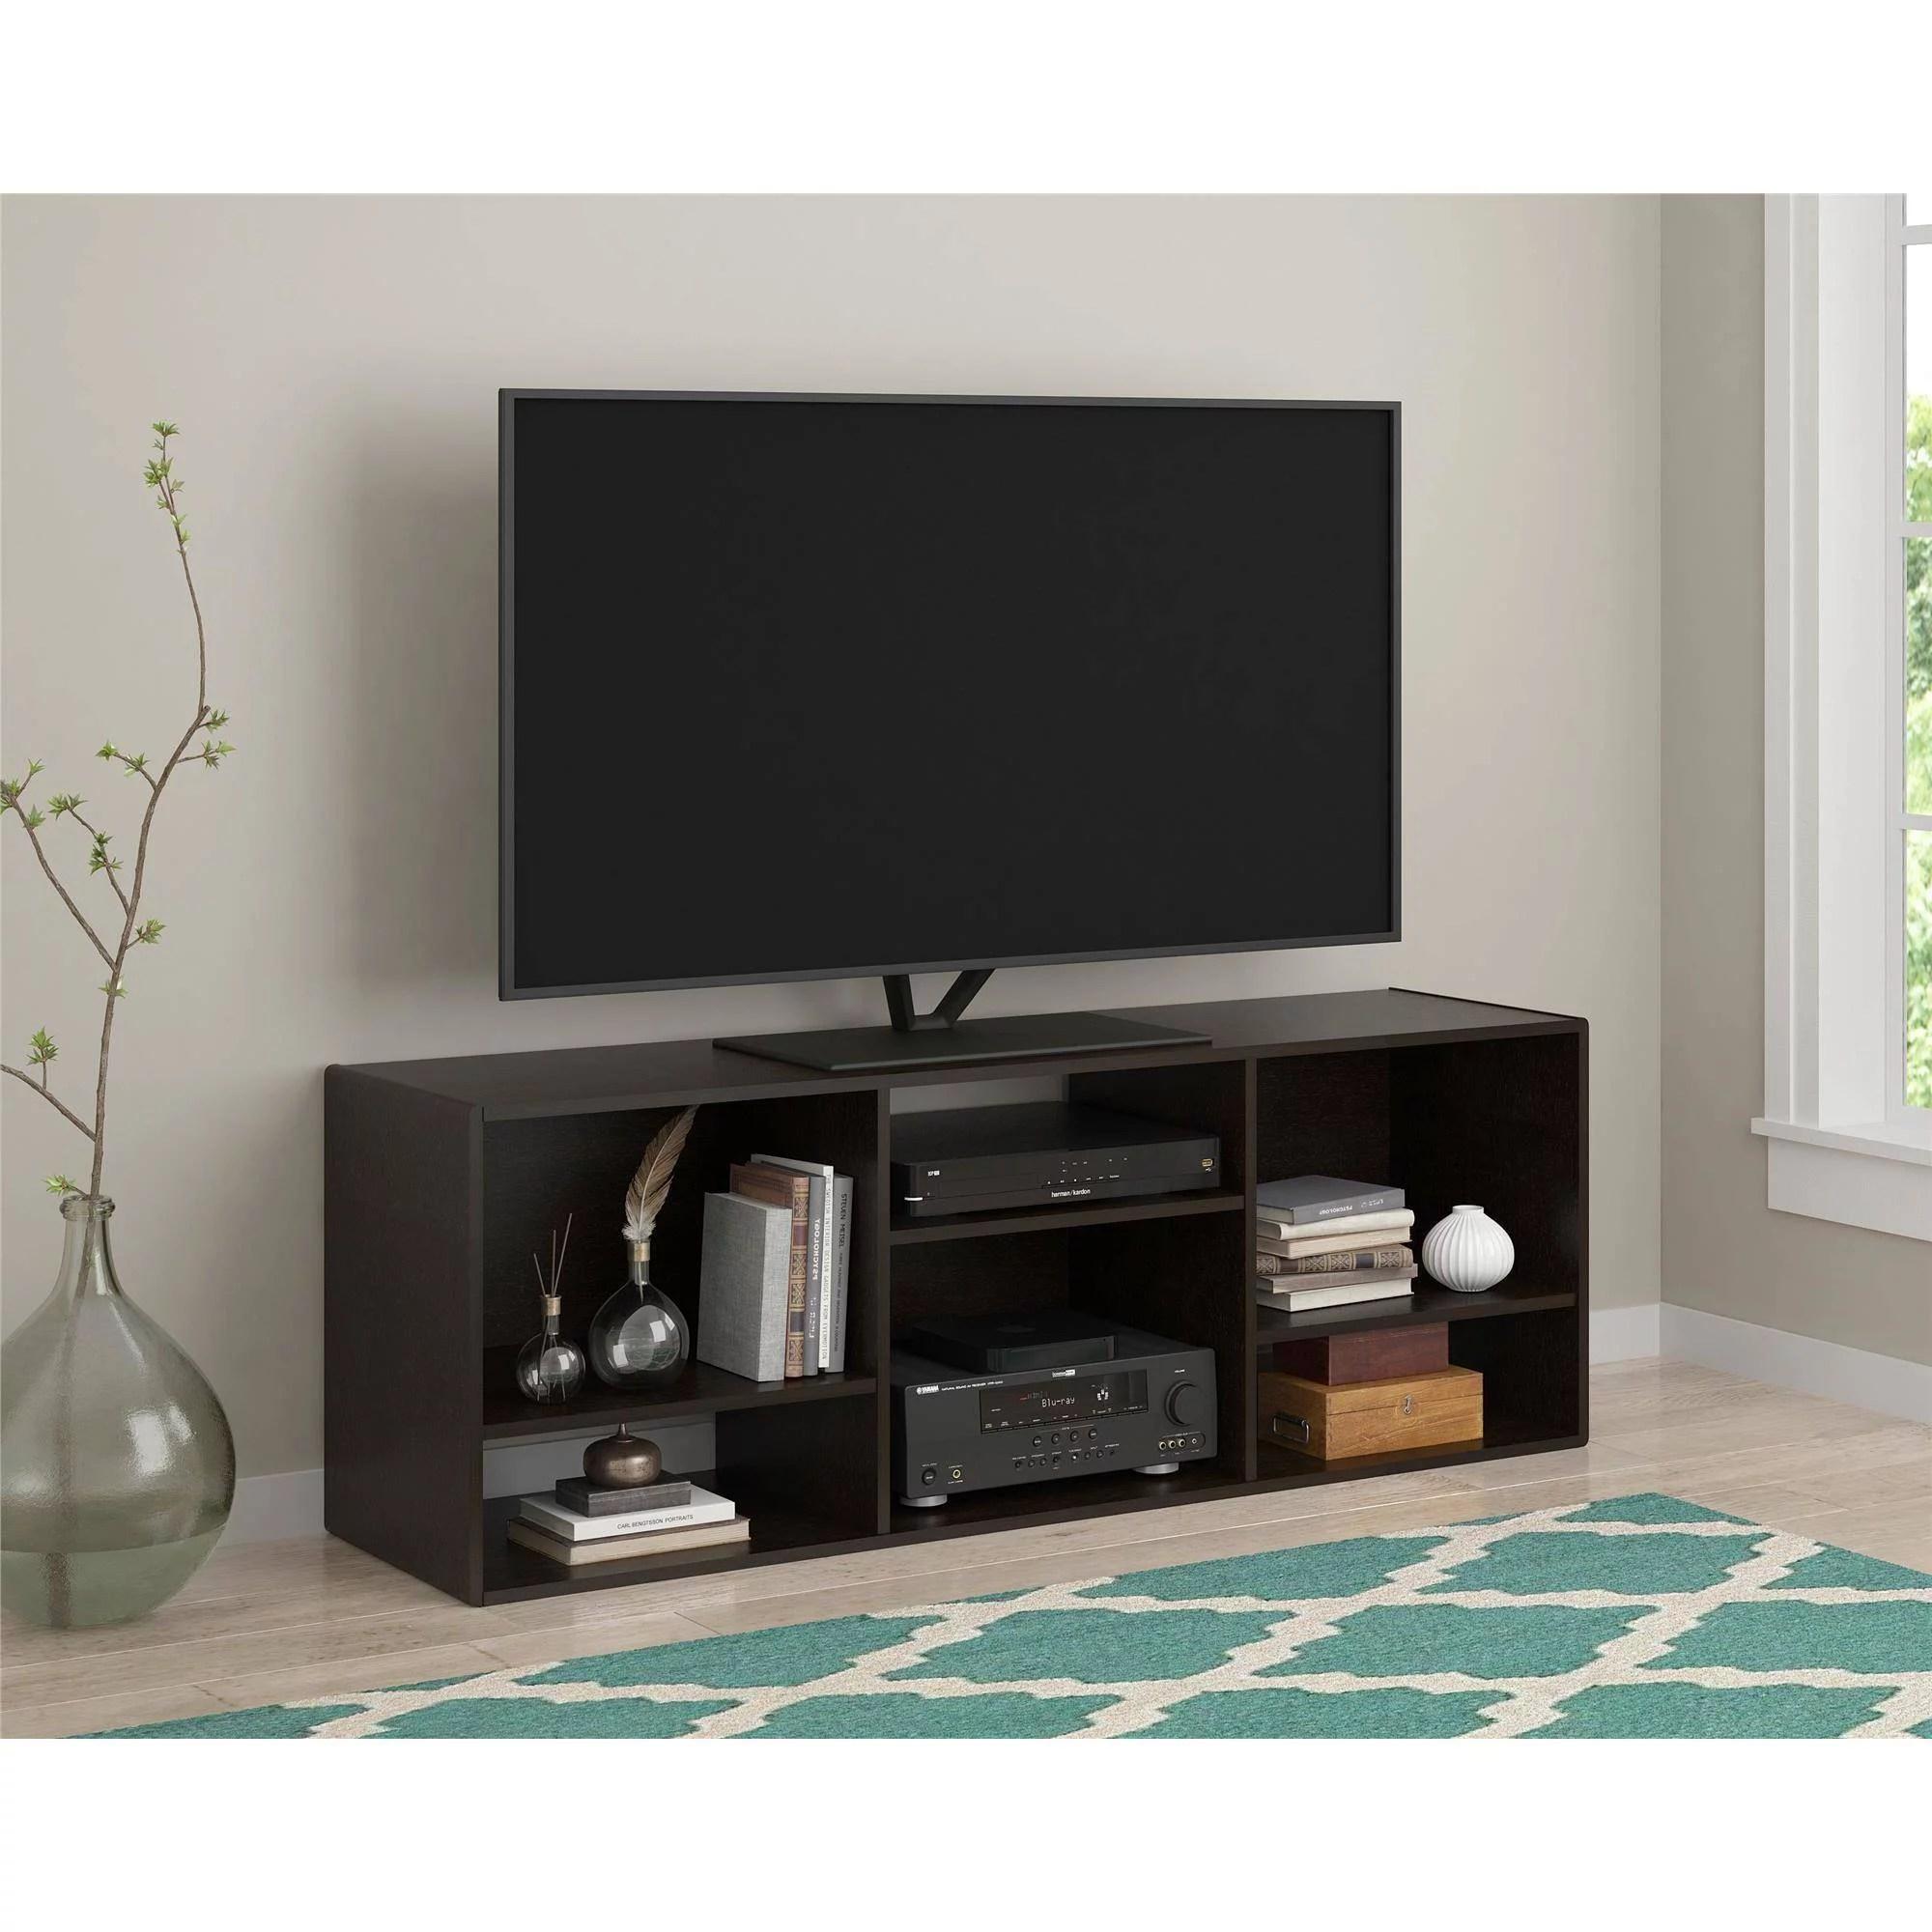 Ameriwood Home Nash Bookcase Tv Stand For Tvs Up To 60 Espresso Walmart Com